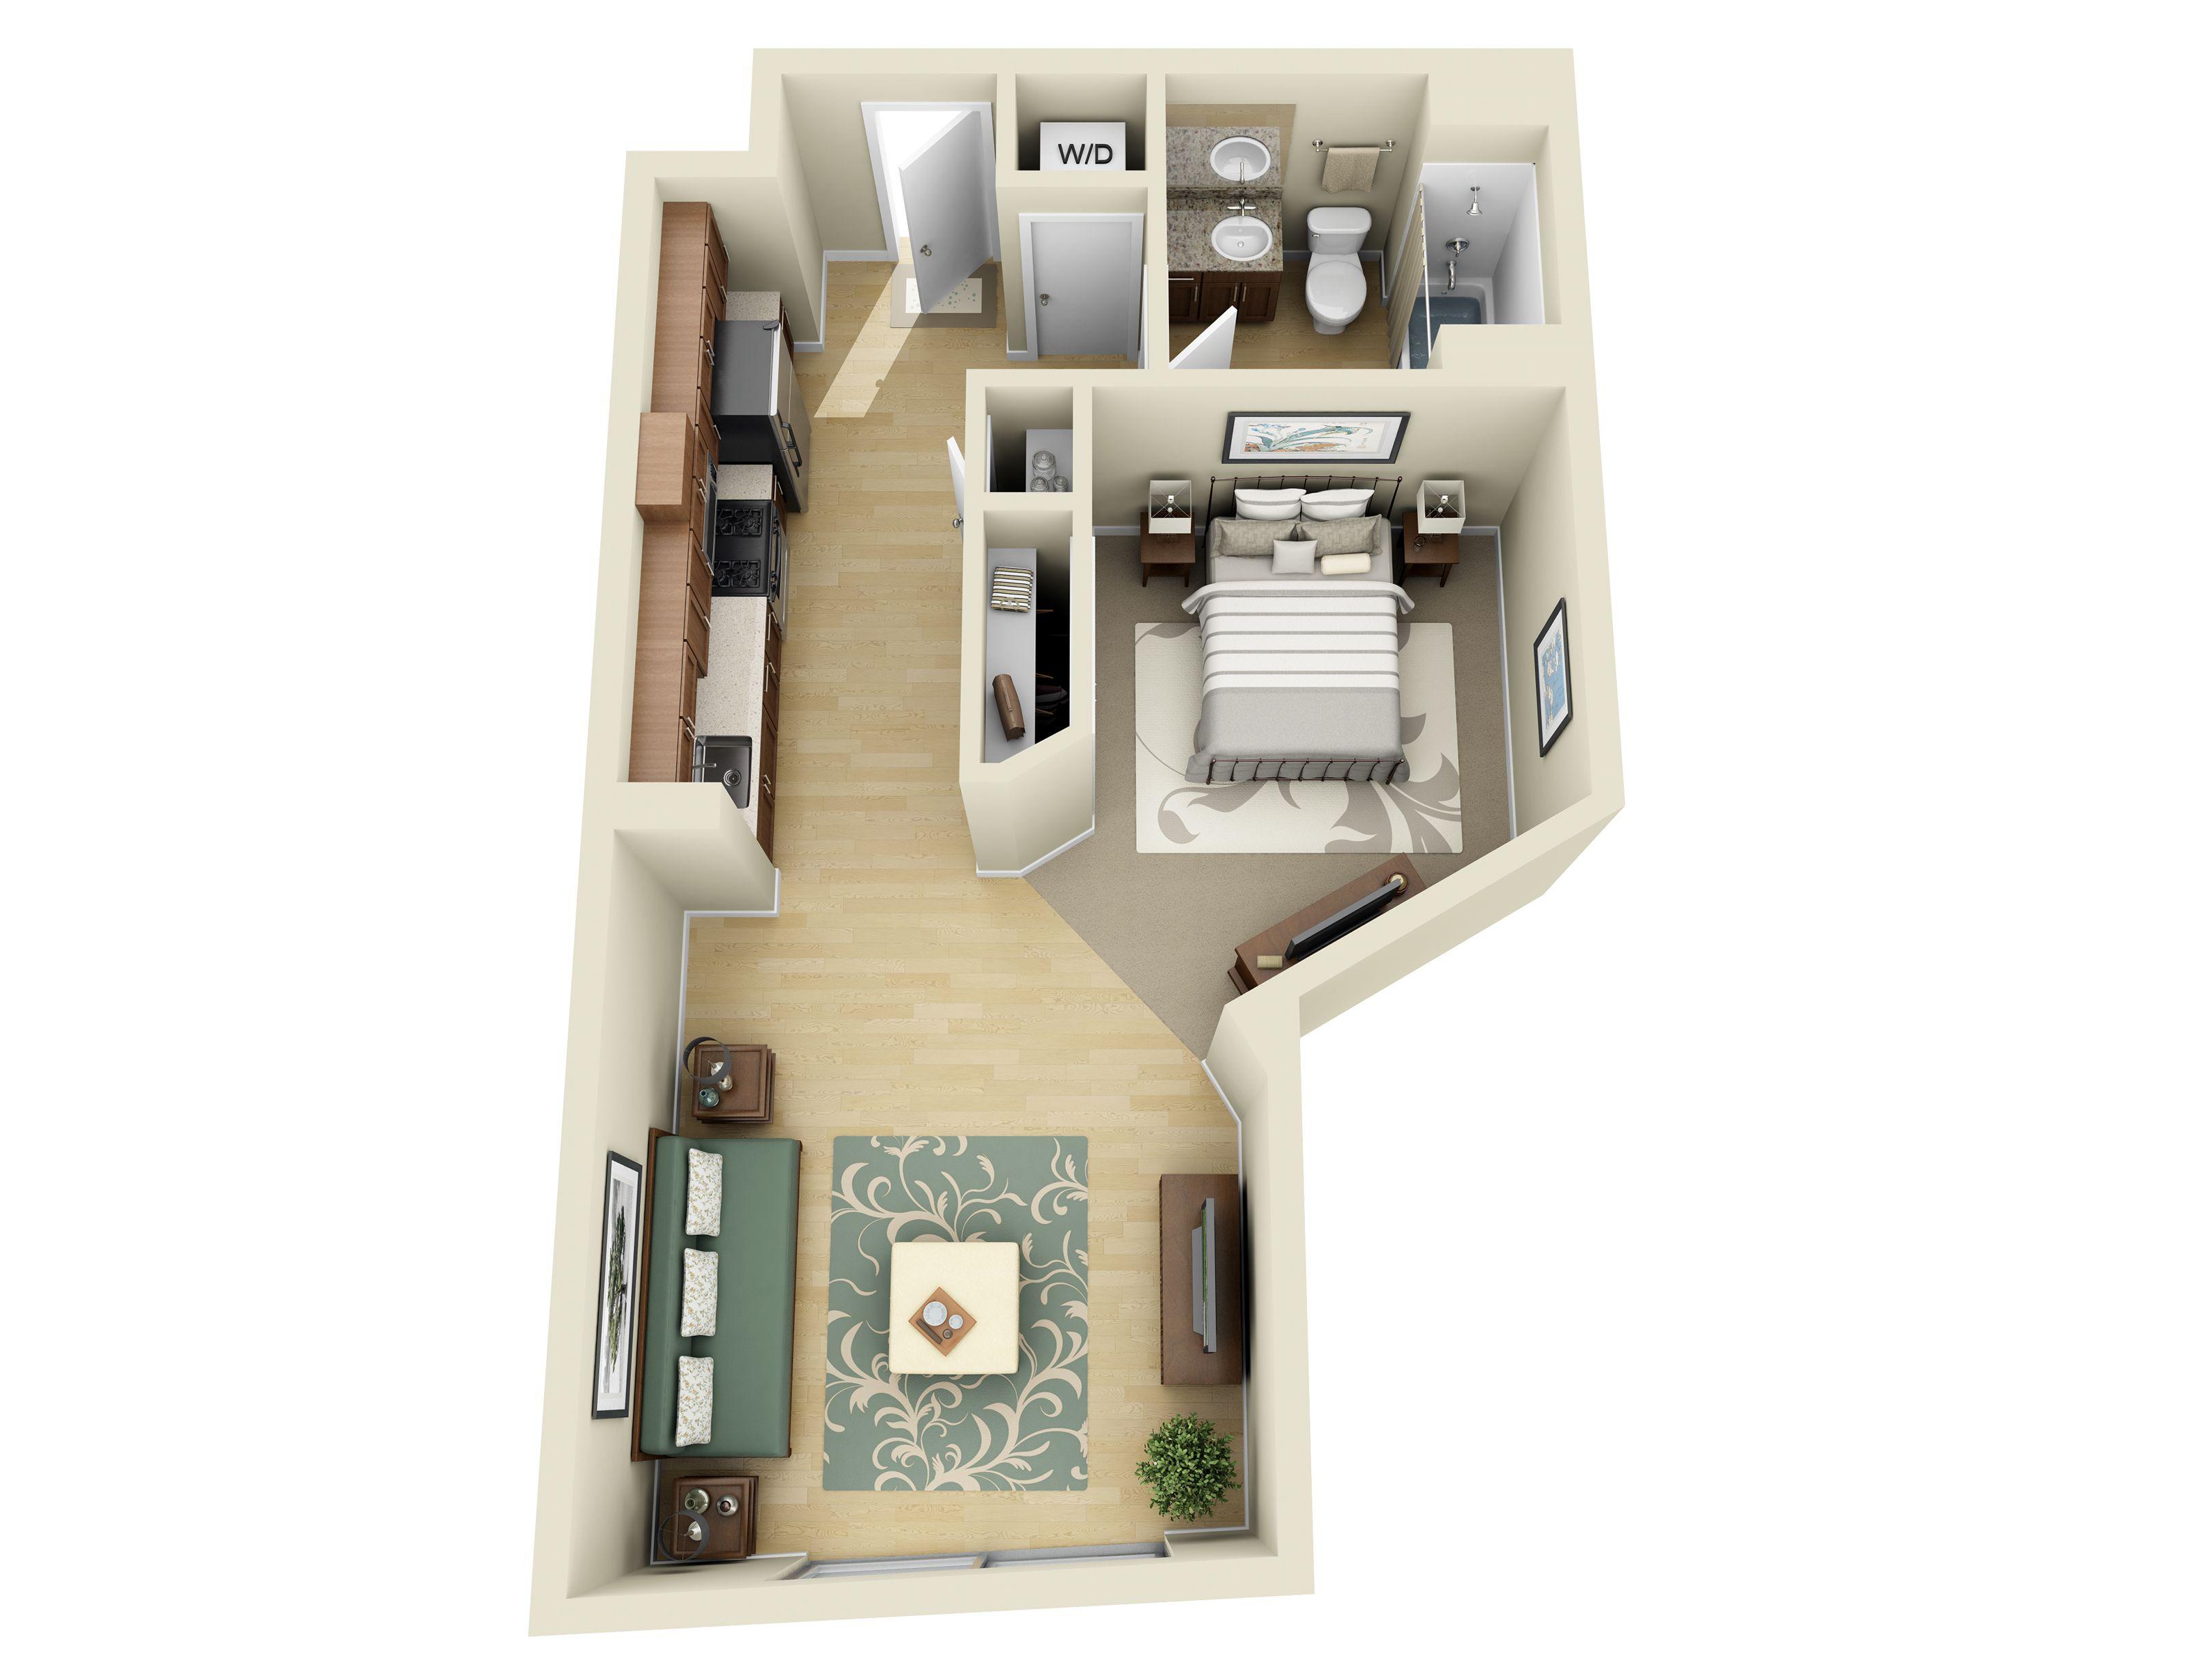 Studio 1 2 And 3 Bedroom Apartments In Los Angeles Bedroom